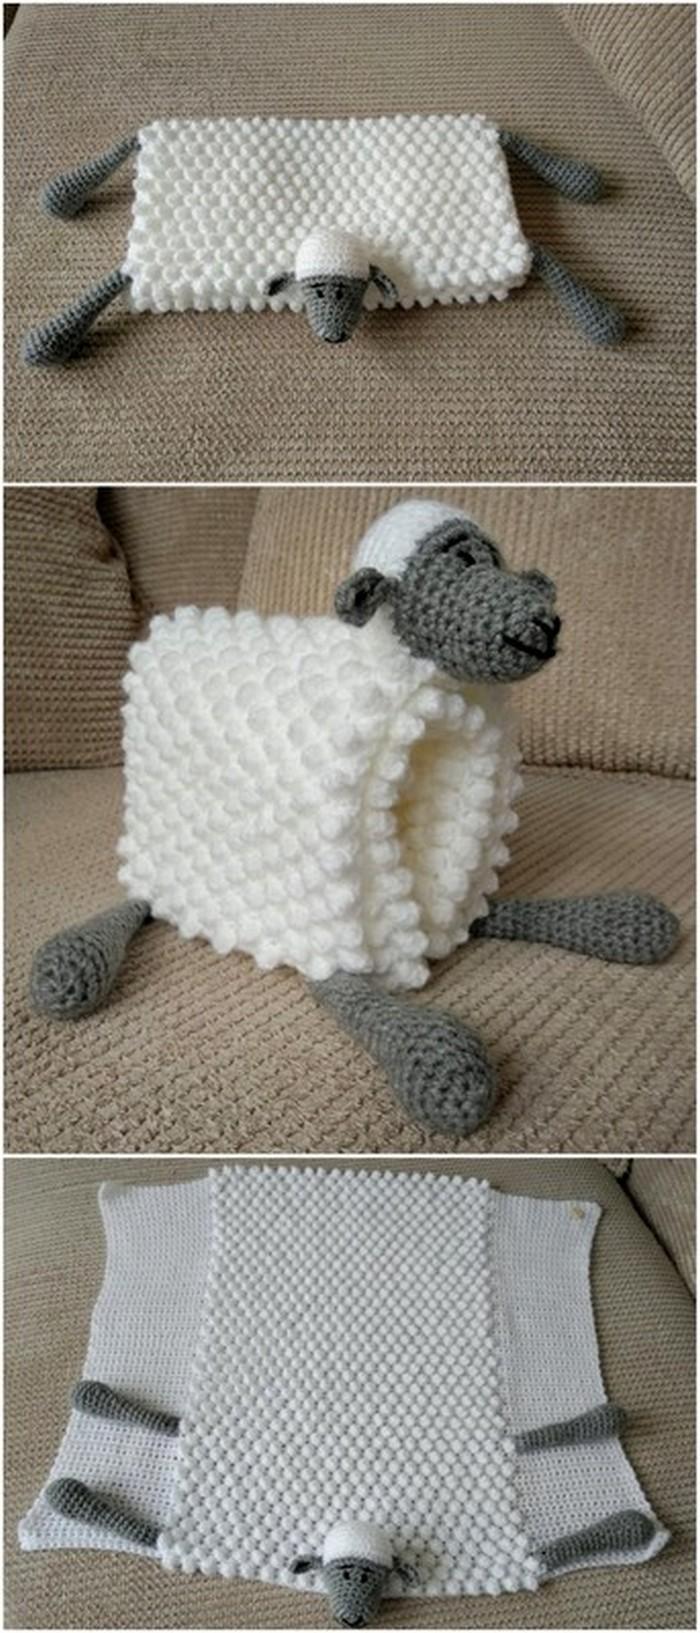 fabulous crochet craft for kids